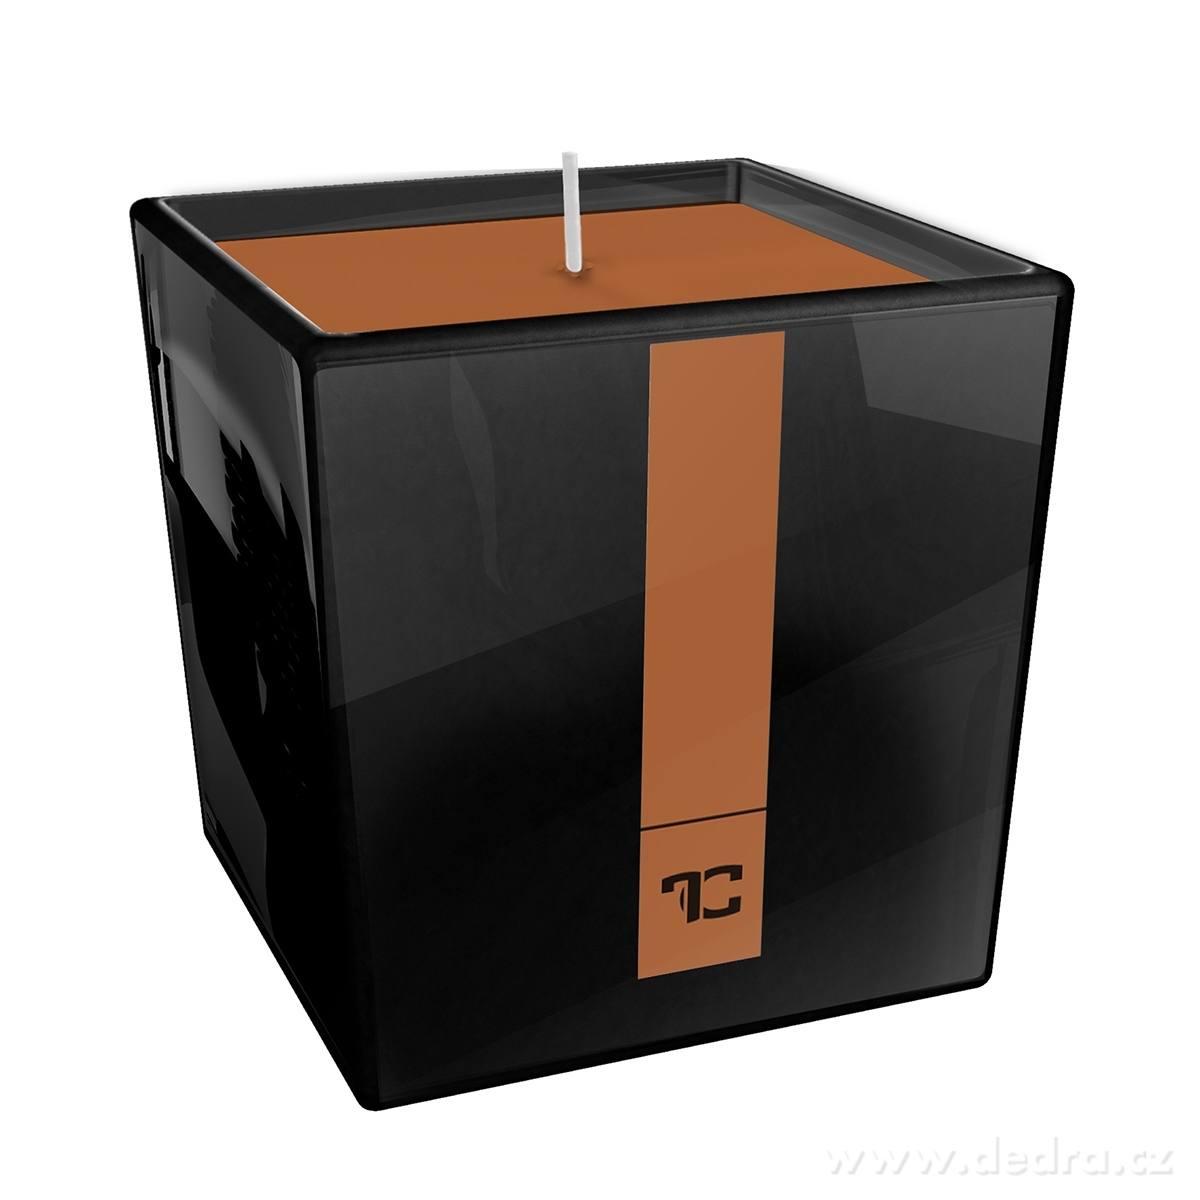 Parfumia sviečka NUIT DE MADAGASCAR